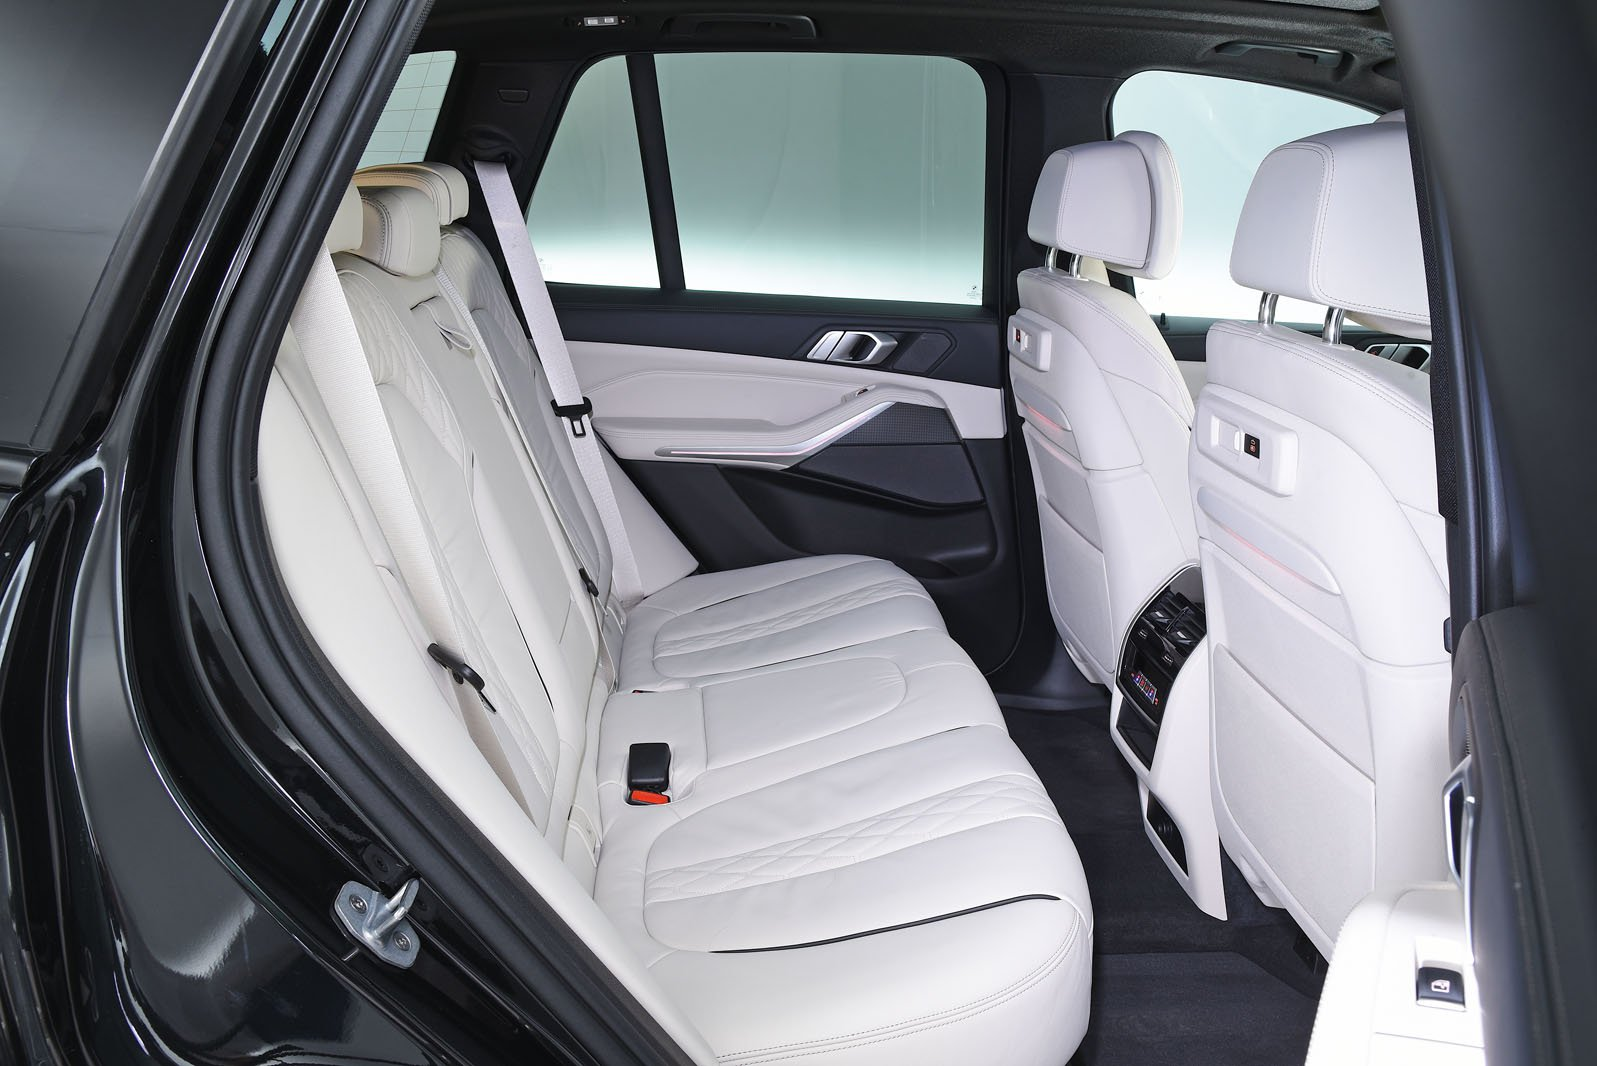 BMW X5 seats